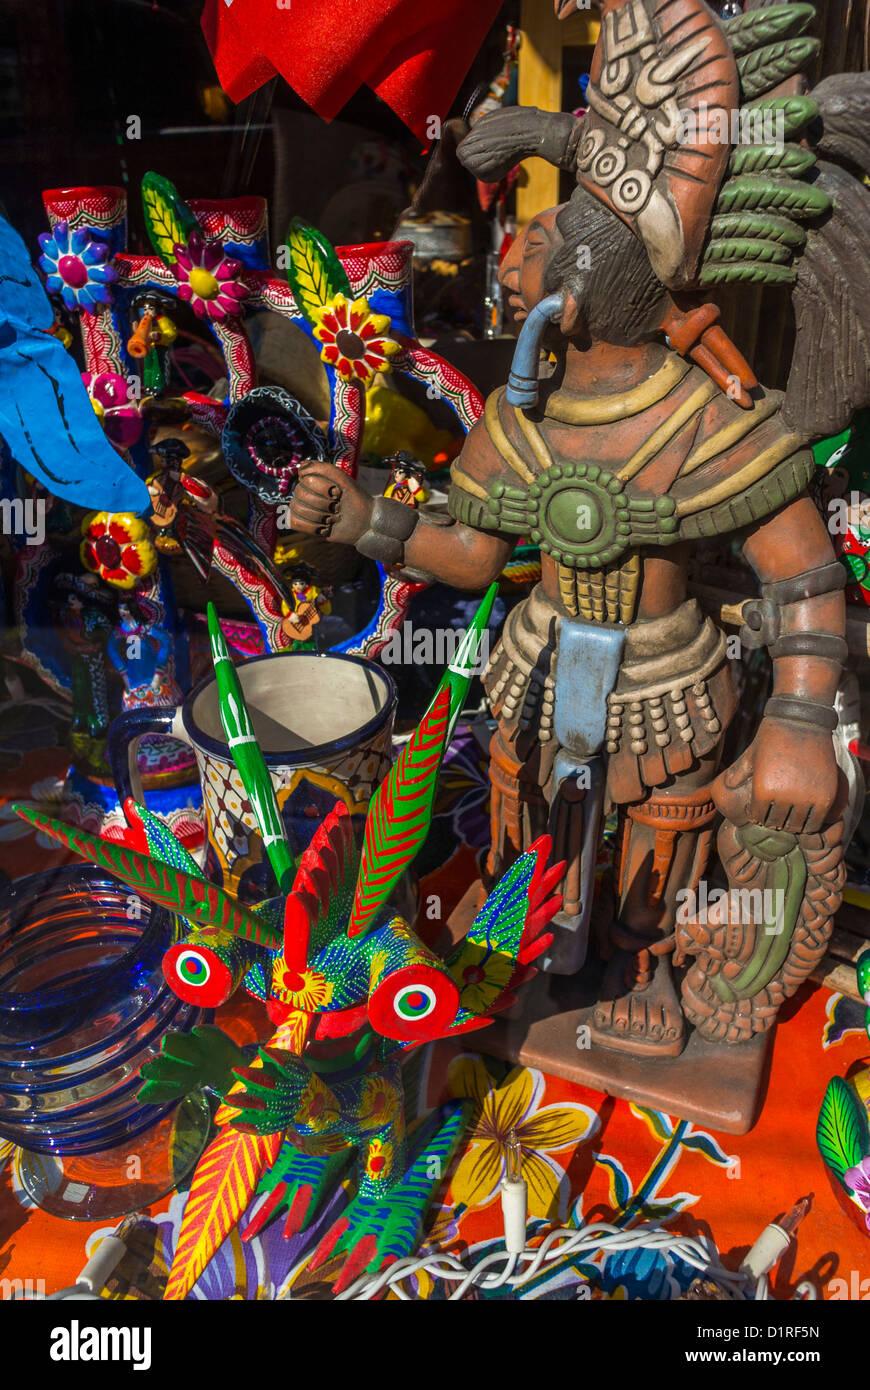 New York, NY, USA, East Village Shopping, 'La Sirena' Mexican Art, Objects, Window Display - Stock Image